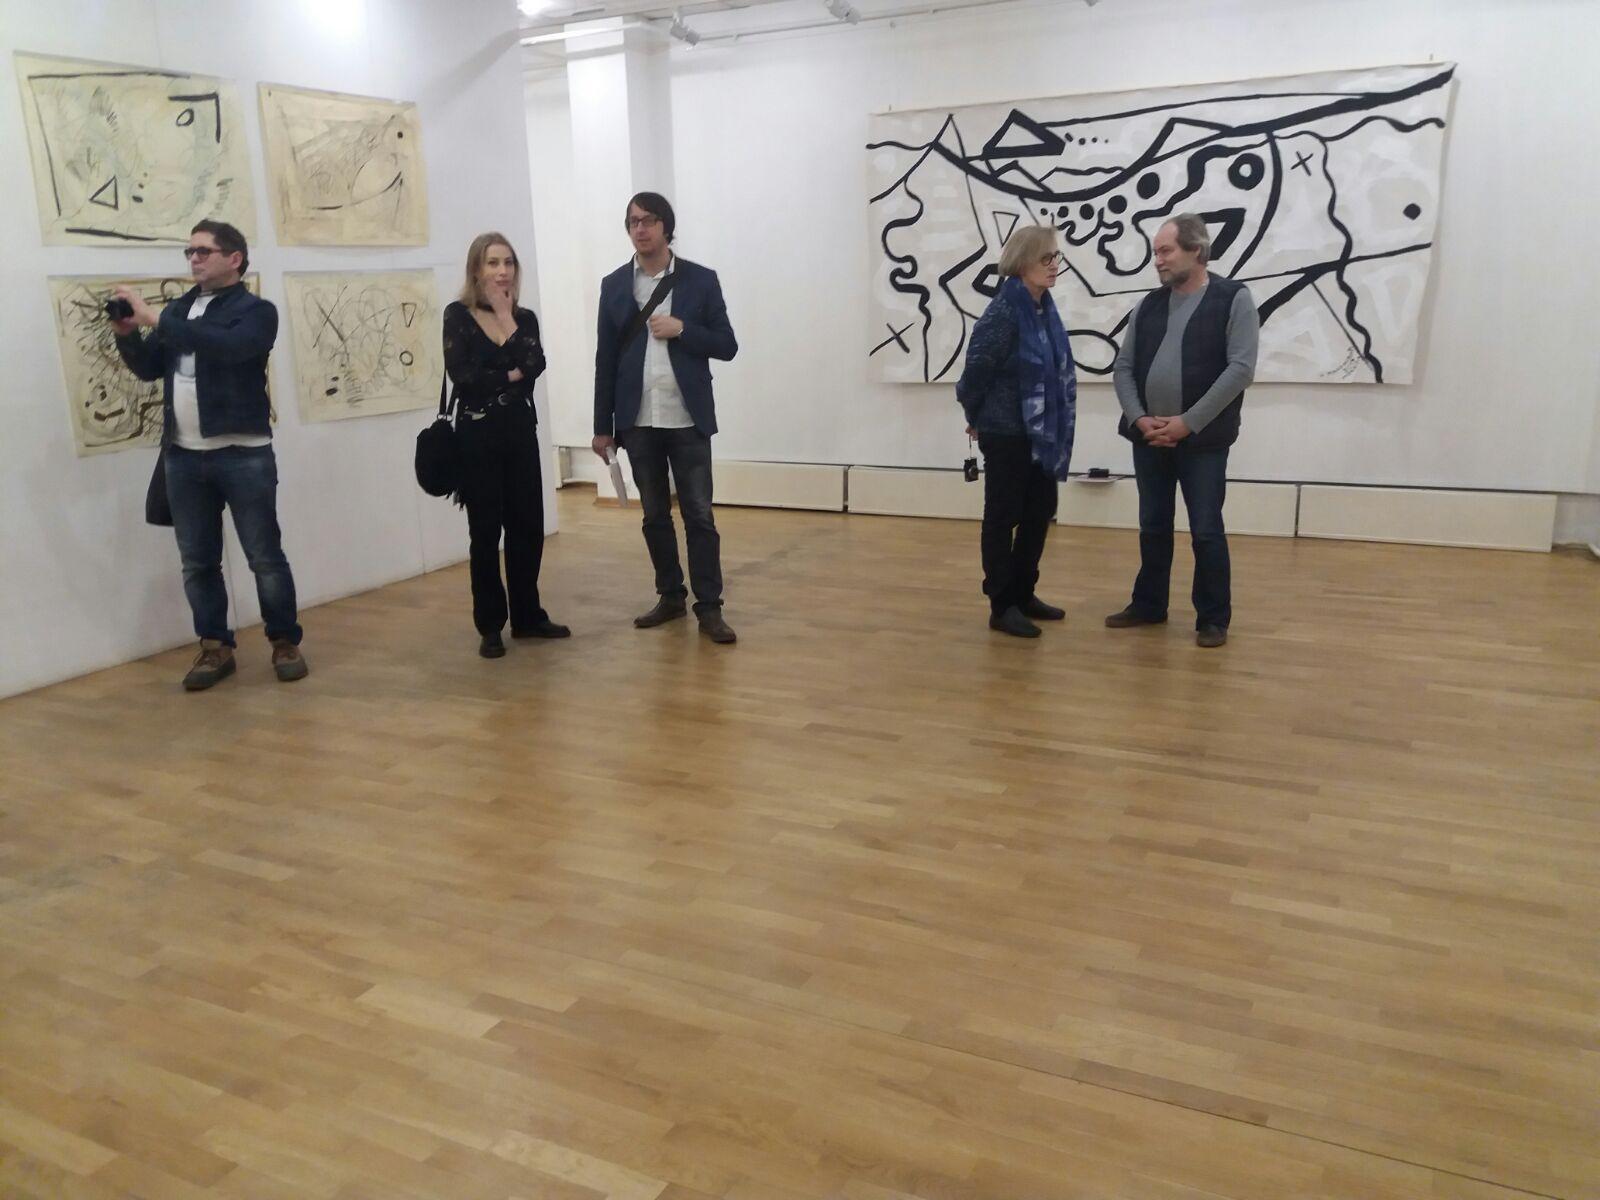 "У Москви је отворена српско-руска изложба под називом ,,Взаимодействие структур"""